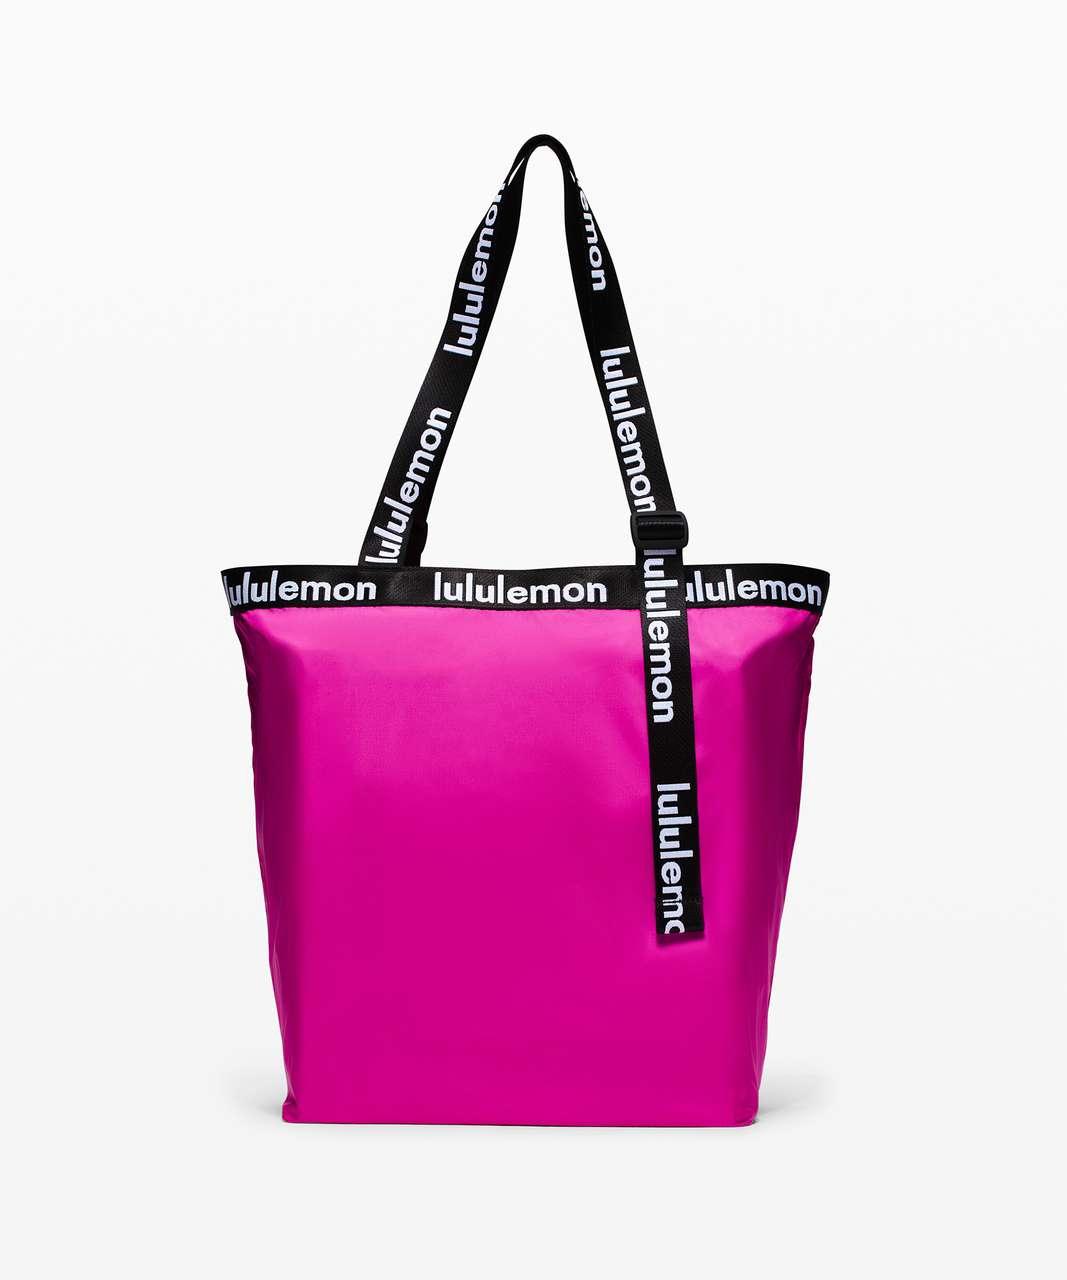 Lululemon The Rest is Written Tote - Highlight Purple